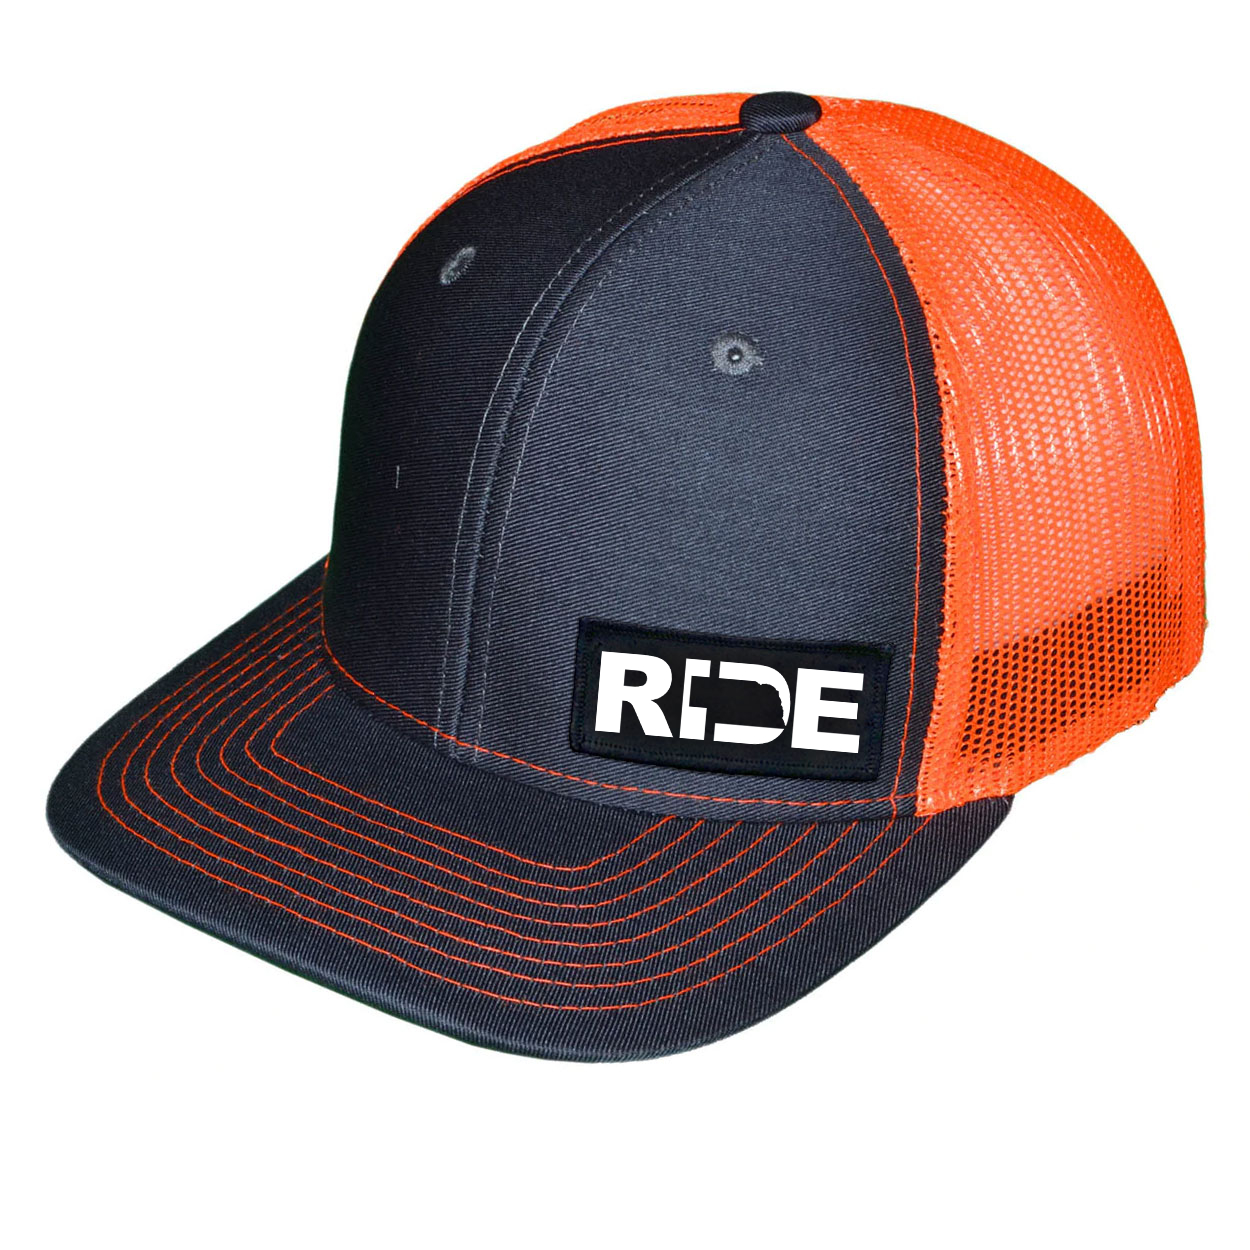 Ride Nebraska Night Out Woven Patch Snapback Trucker Hat Dark Gray/Orange (White Logo)